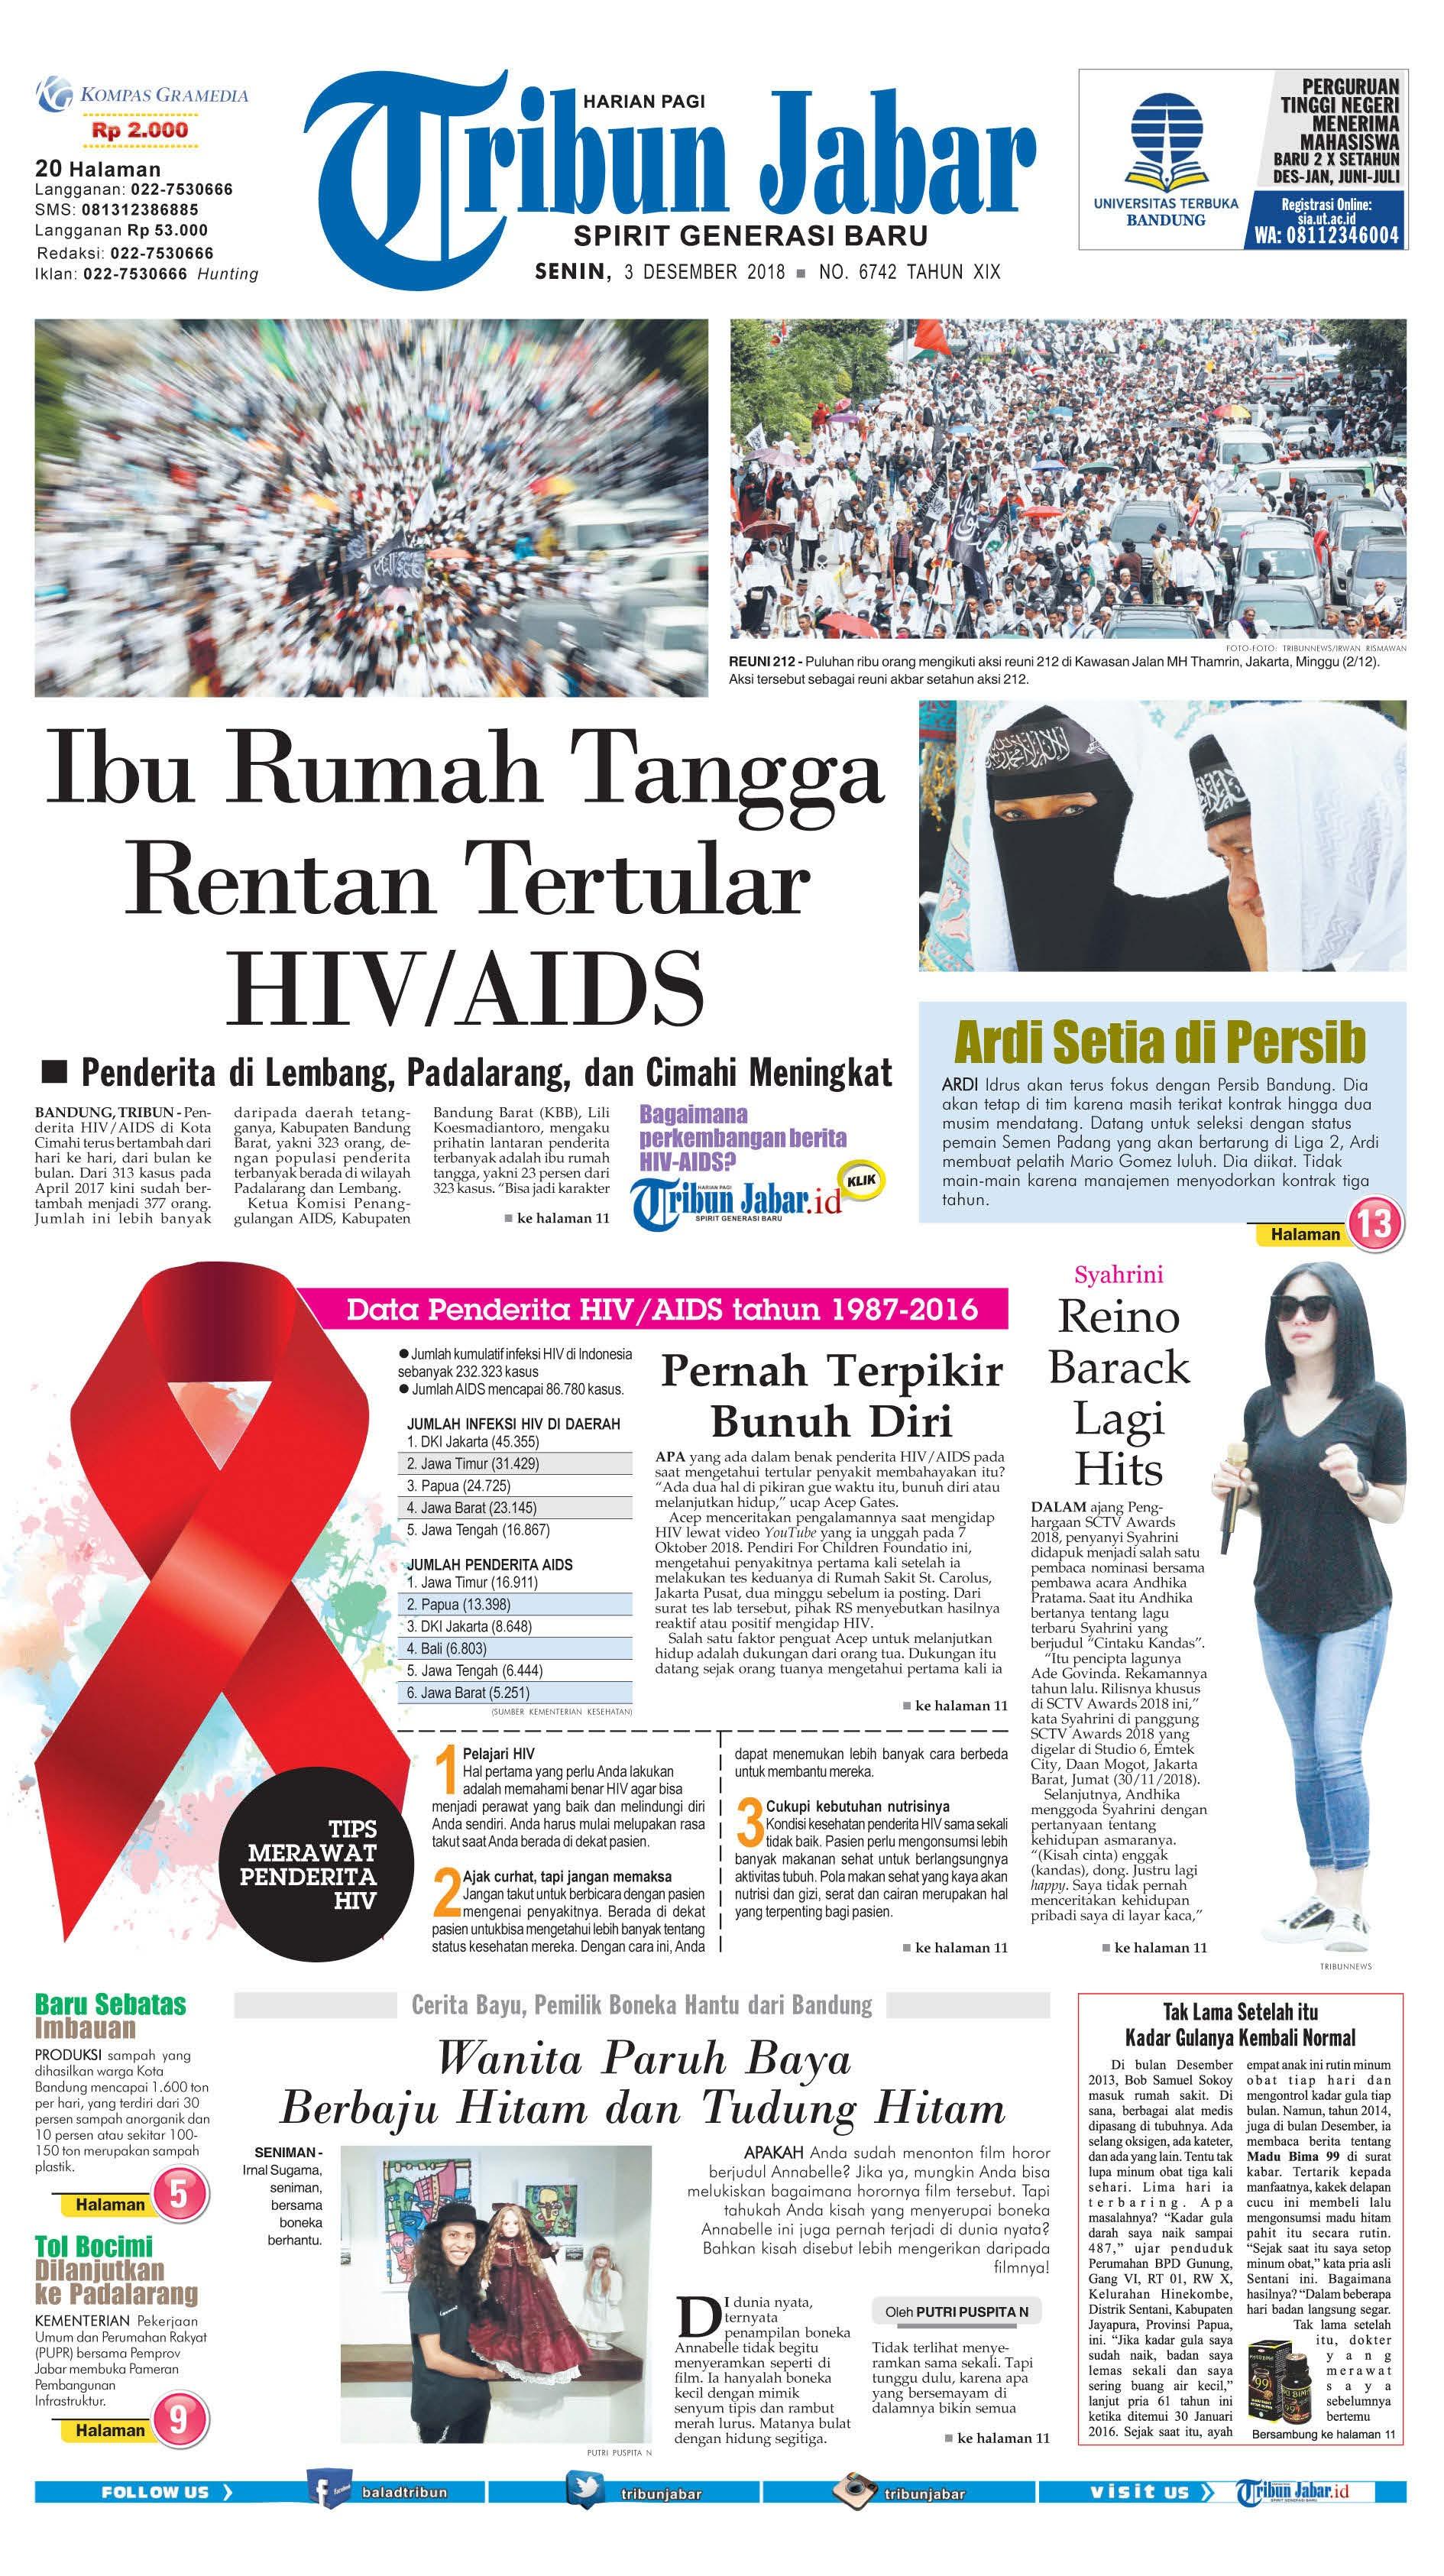 Tribun Jabar Newspaper 03 December 2018 Gramedia Digital